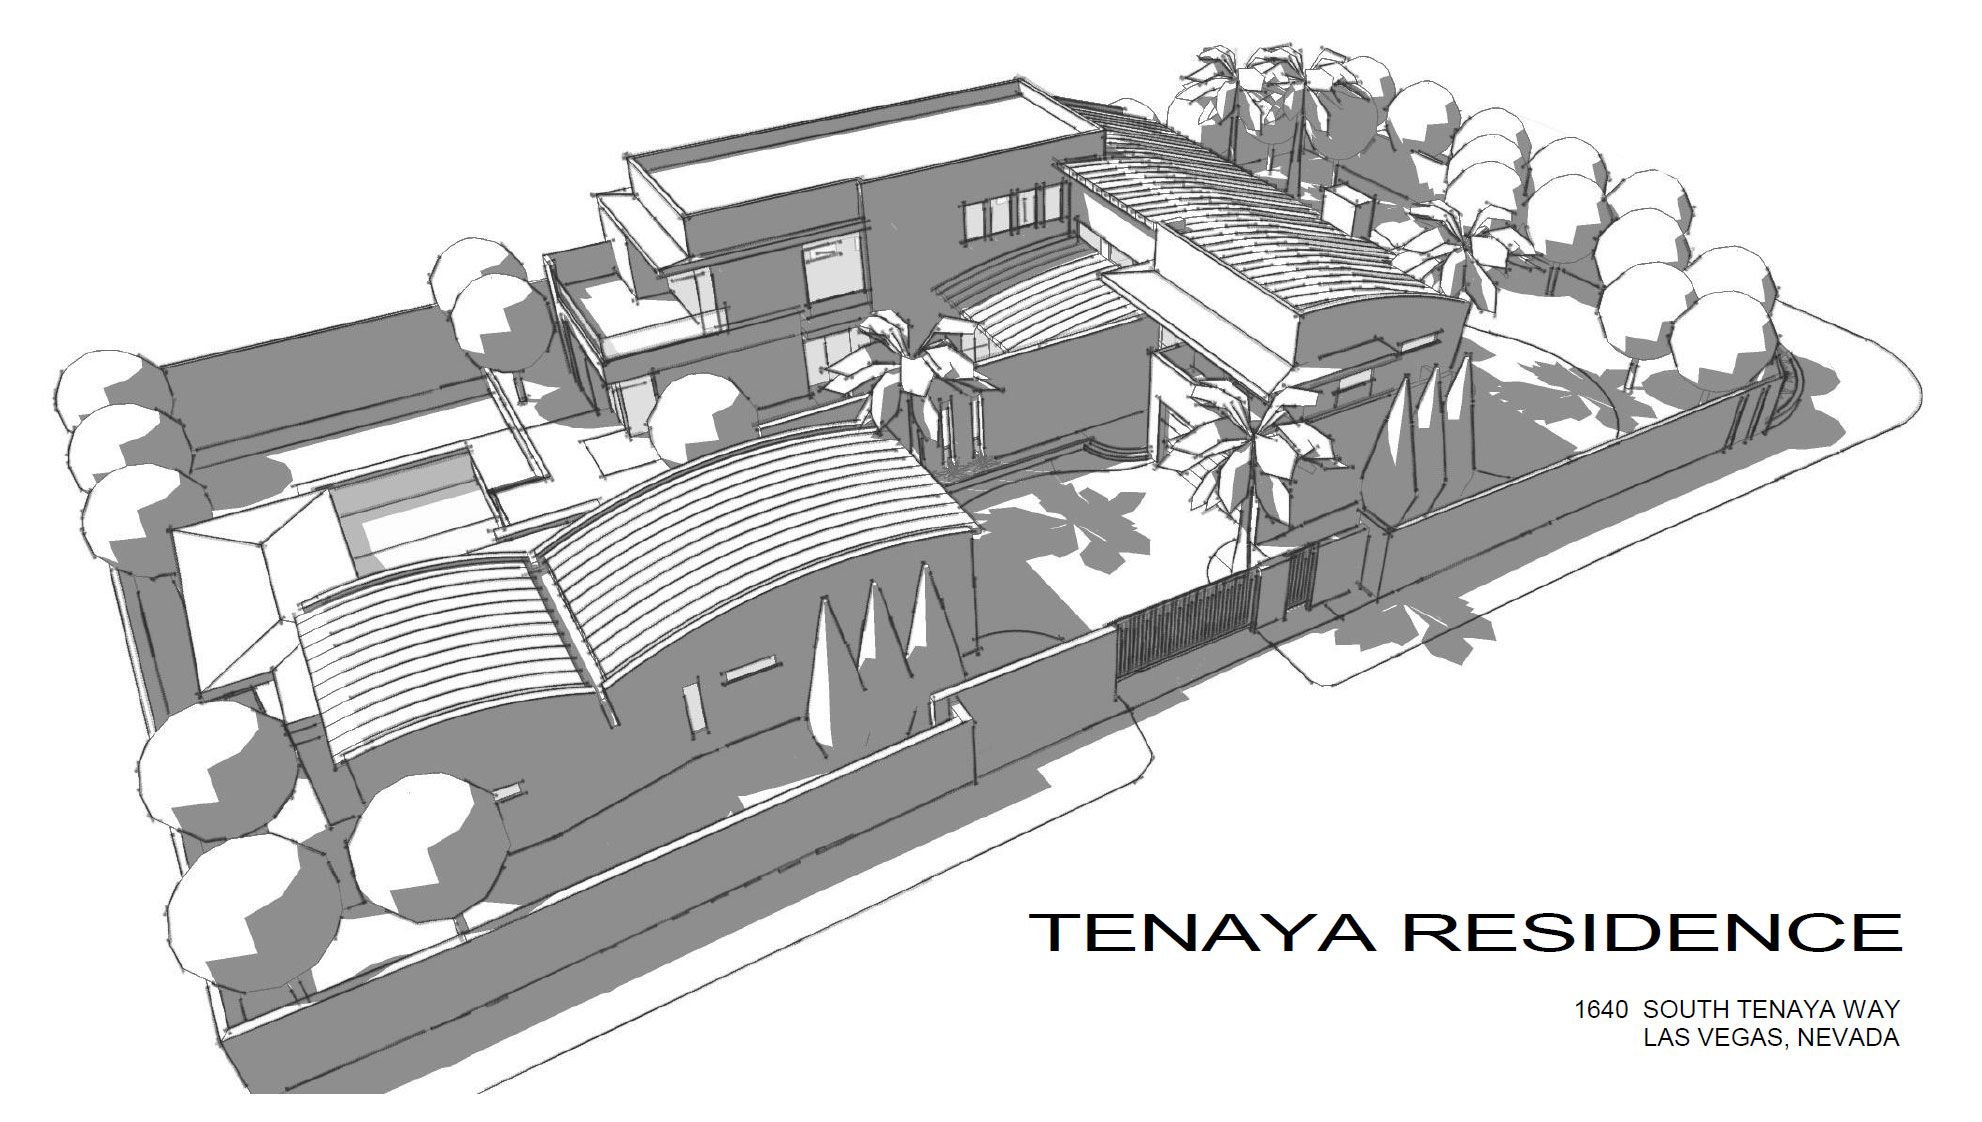 Tenaya-Residence-40